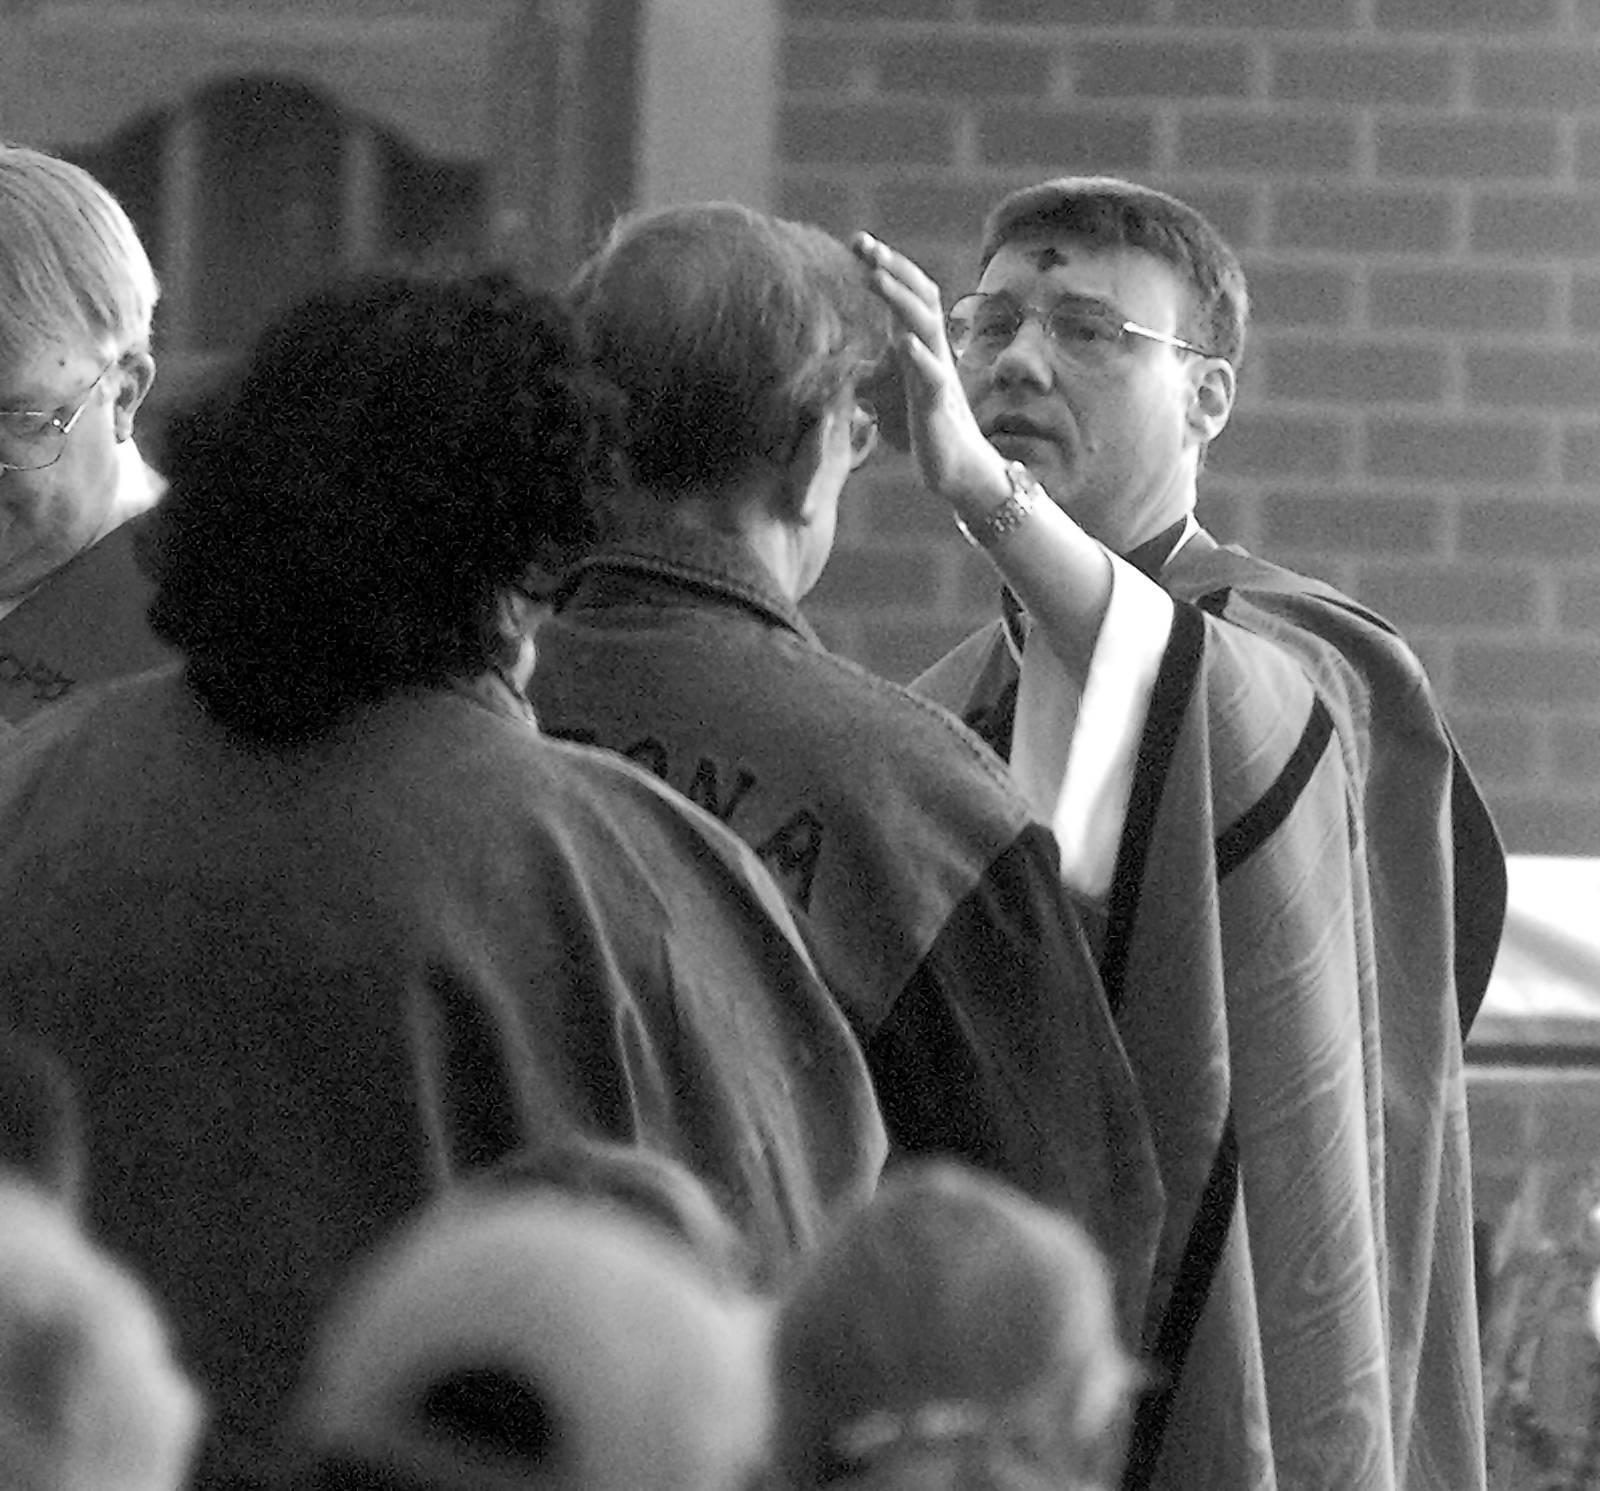 Joseph Wilk, the former pastor of St. Matthew Catholic Church in Schaumburg, in 1998.